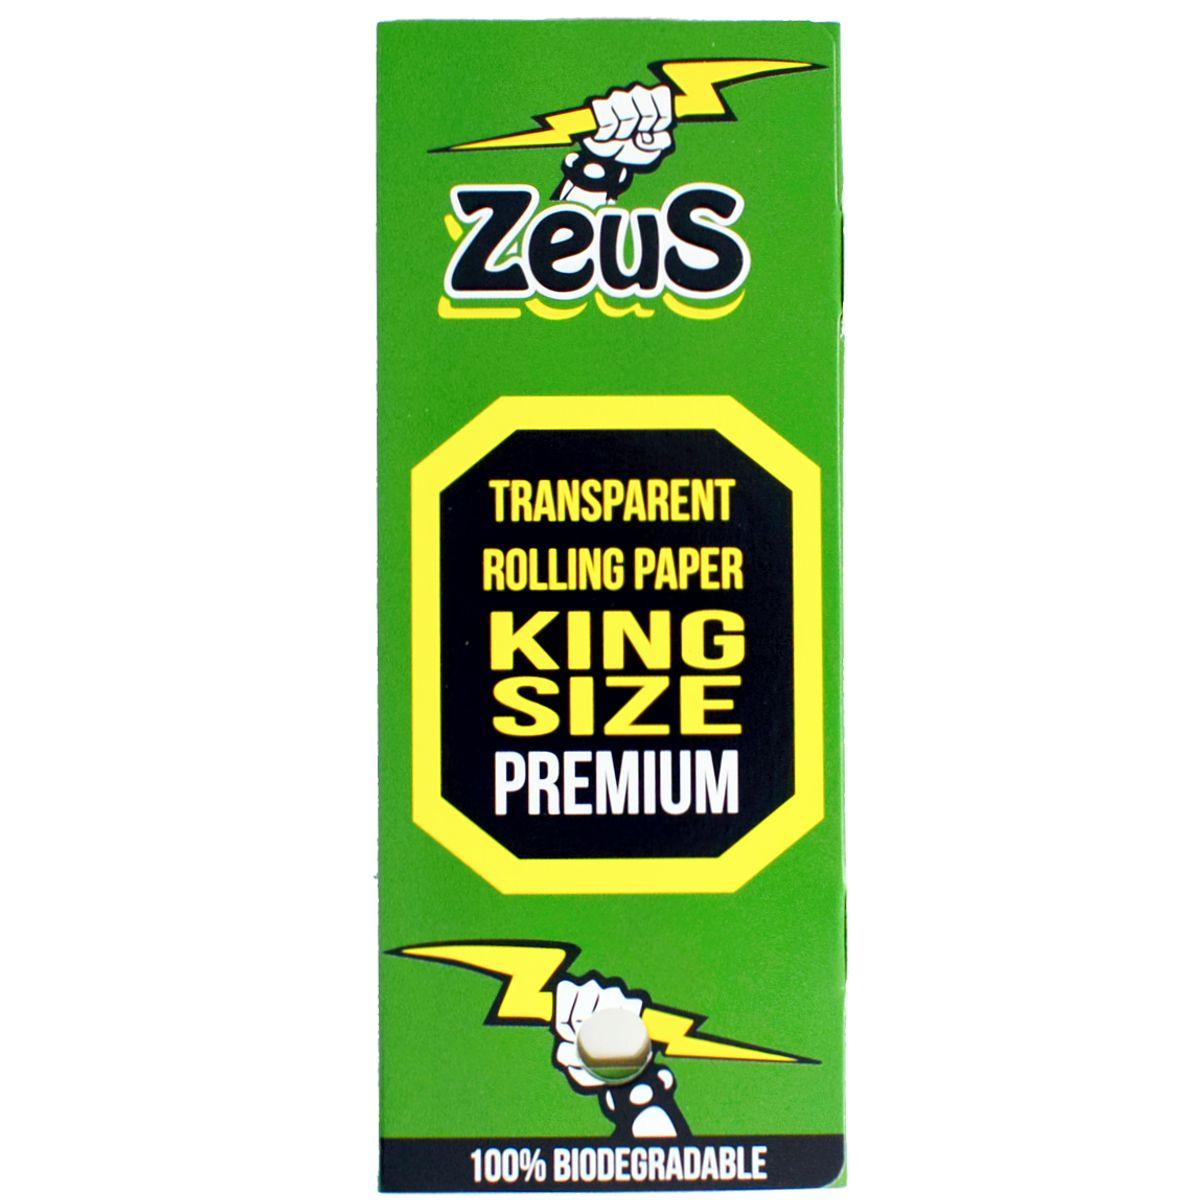 papel celulosa zeus king size venta grow shop